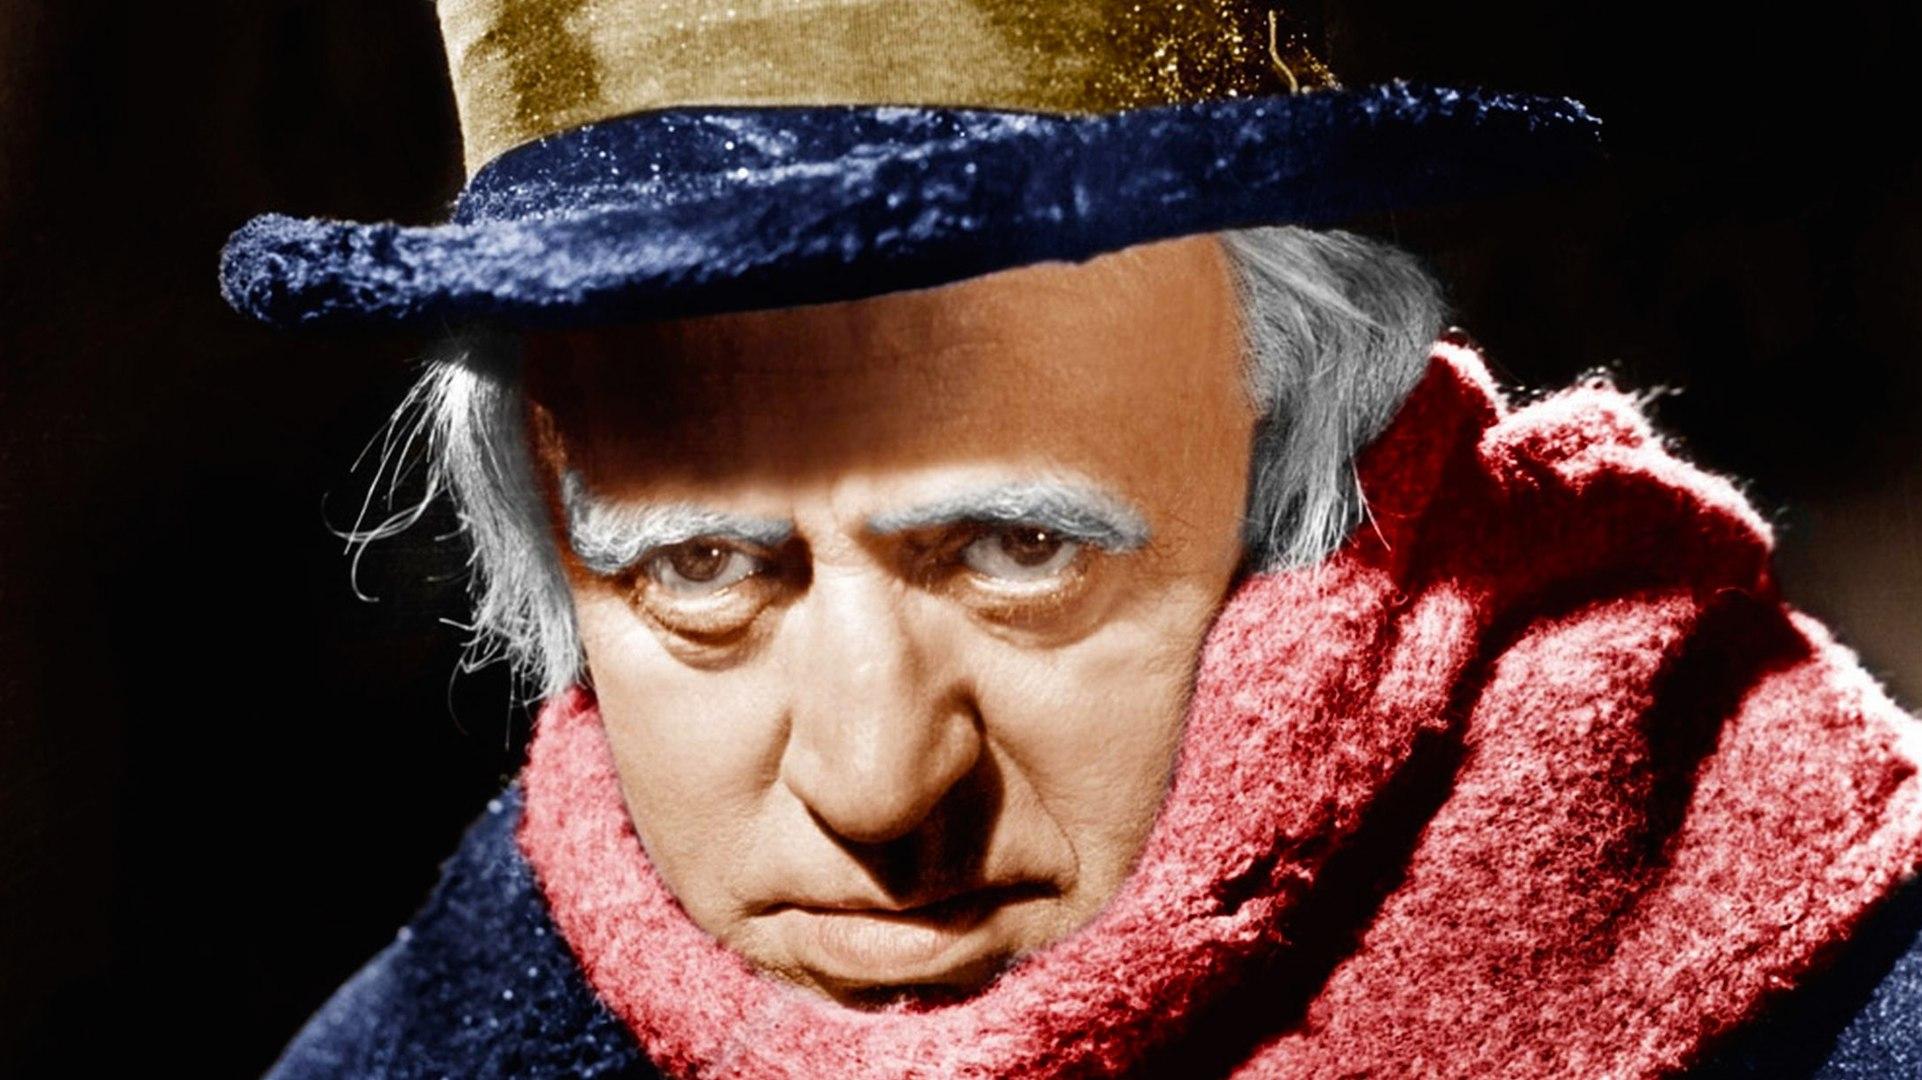 Alister Sims Christmas Carol.A Christmas Carol Scrooge 1951 Hd Alastair Sim Jack Warner Kathleen Harrison Drama Fantasy